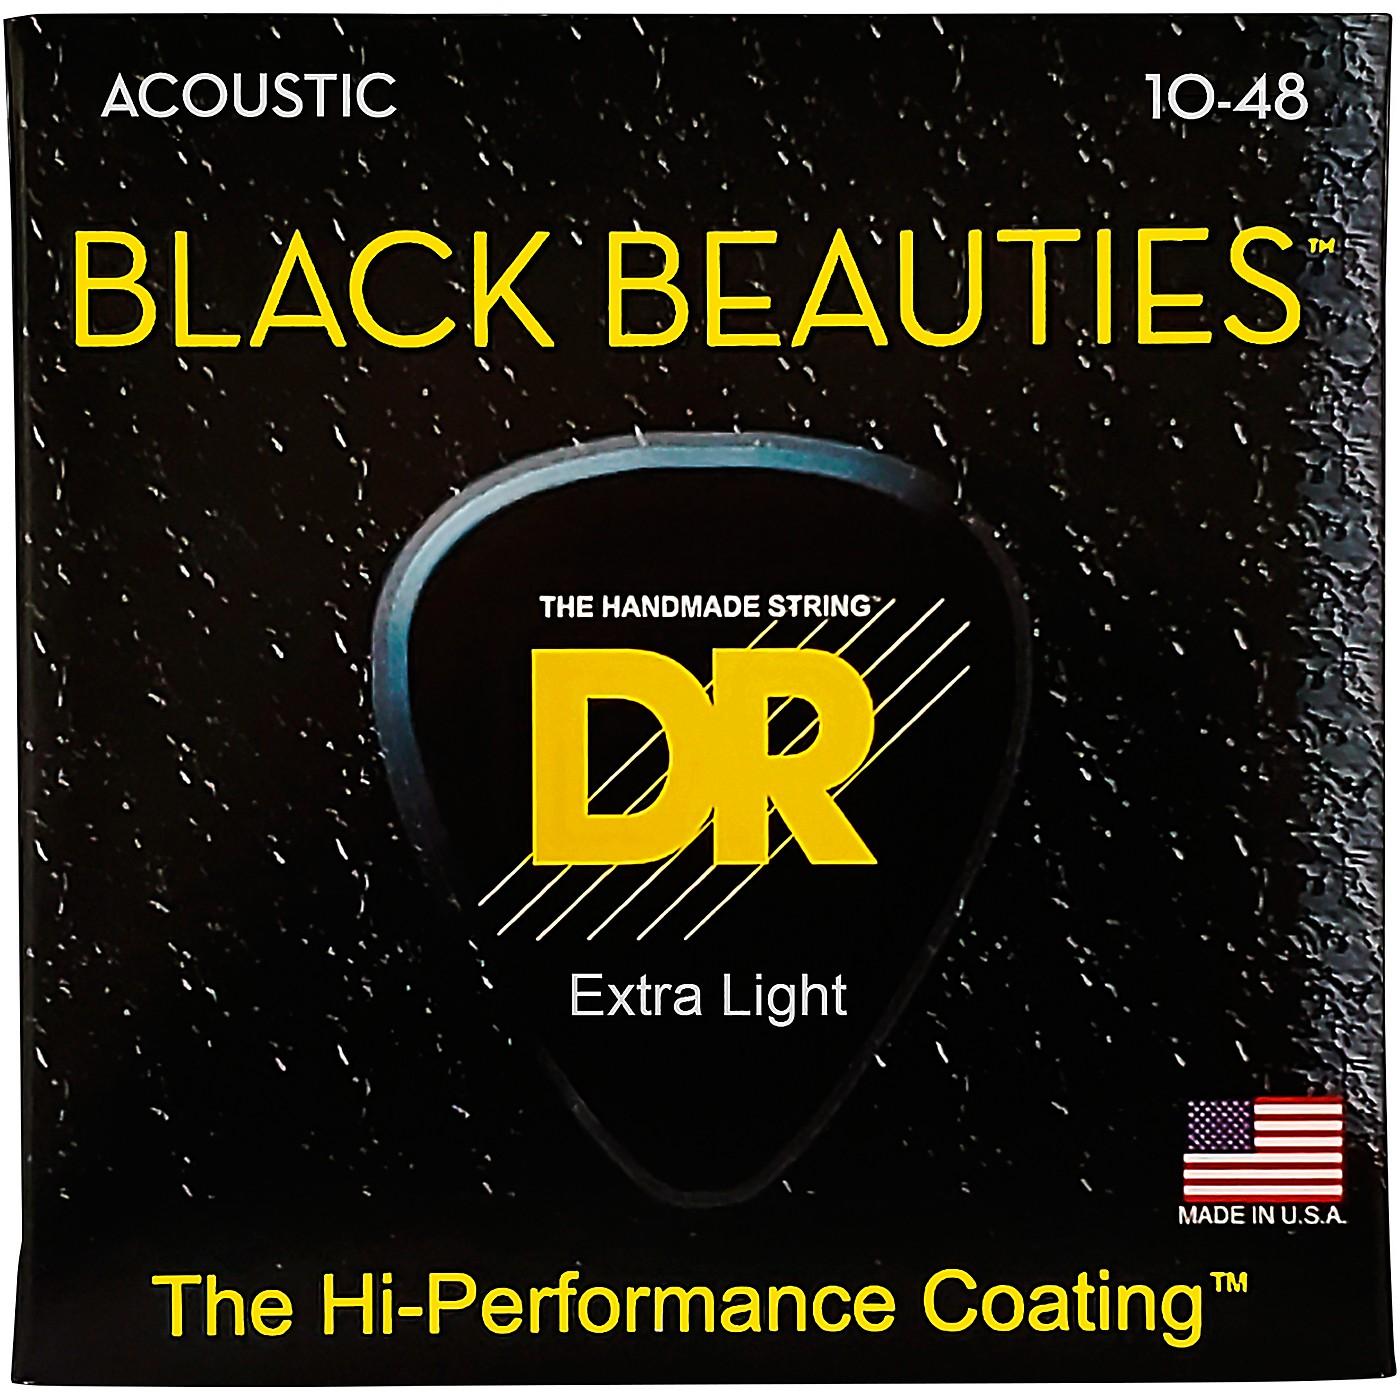 DR Strings Black Beauties Acoustic Guitar Strings Extra Lite thumbnail